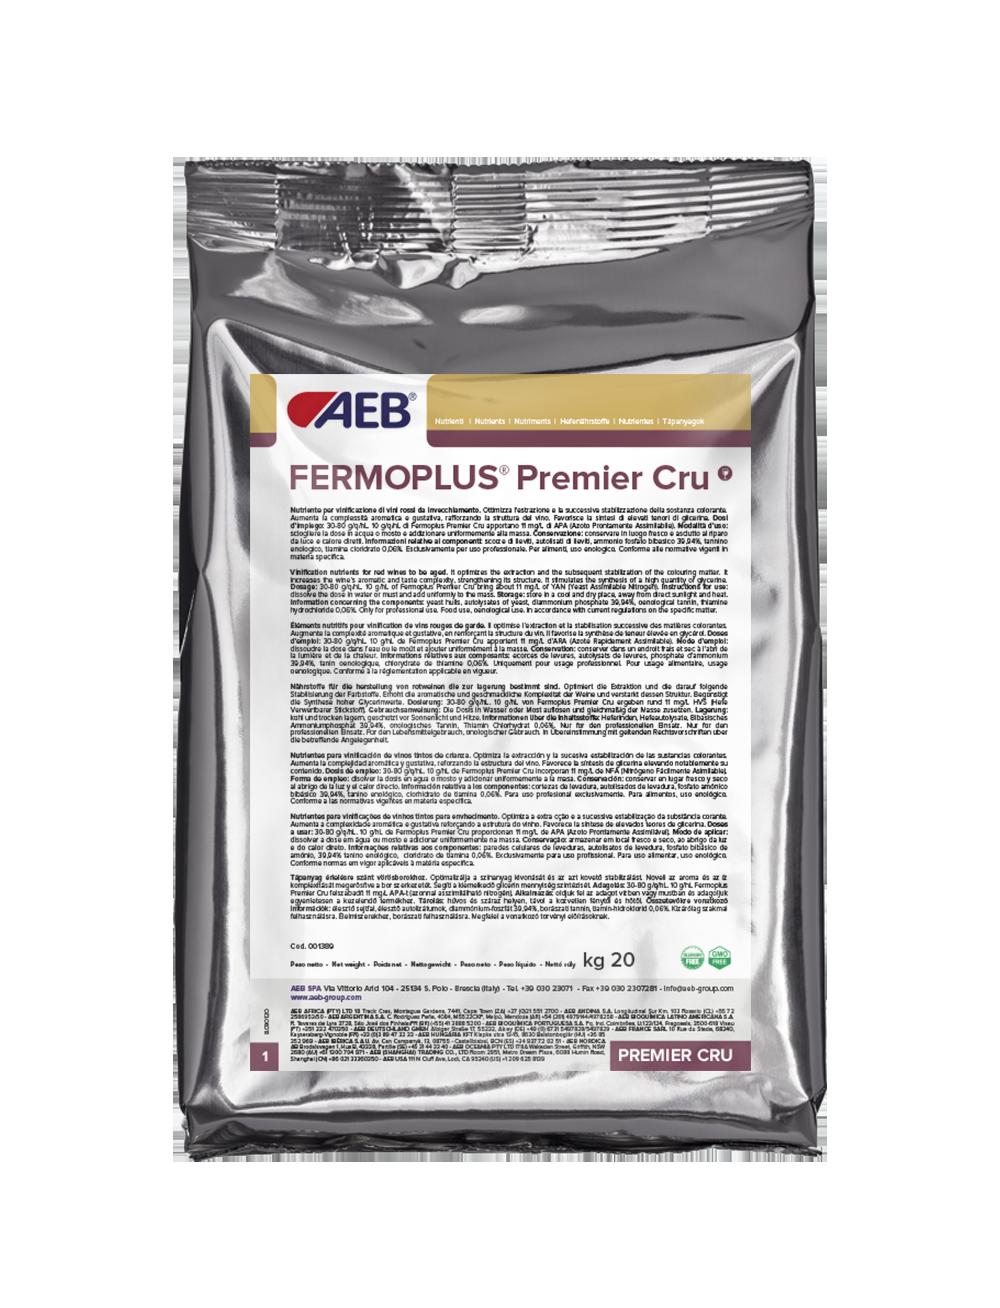 FERMOPLUS Premier Cru